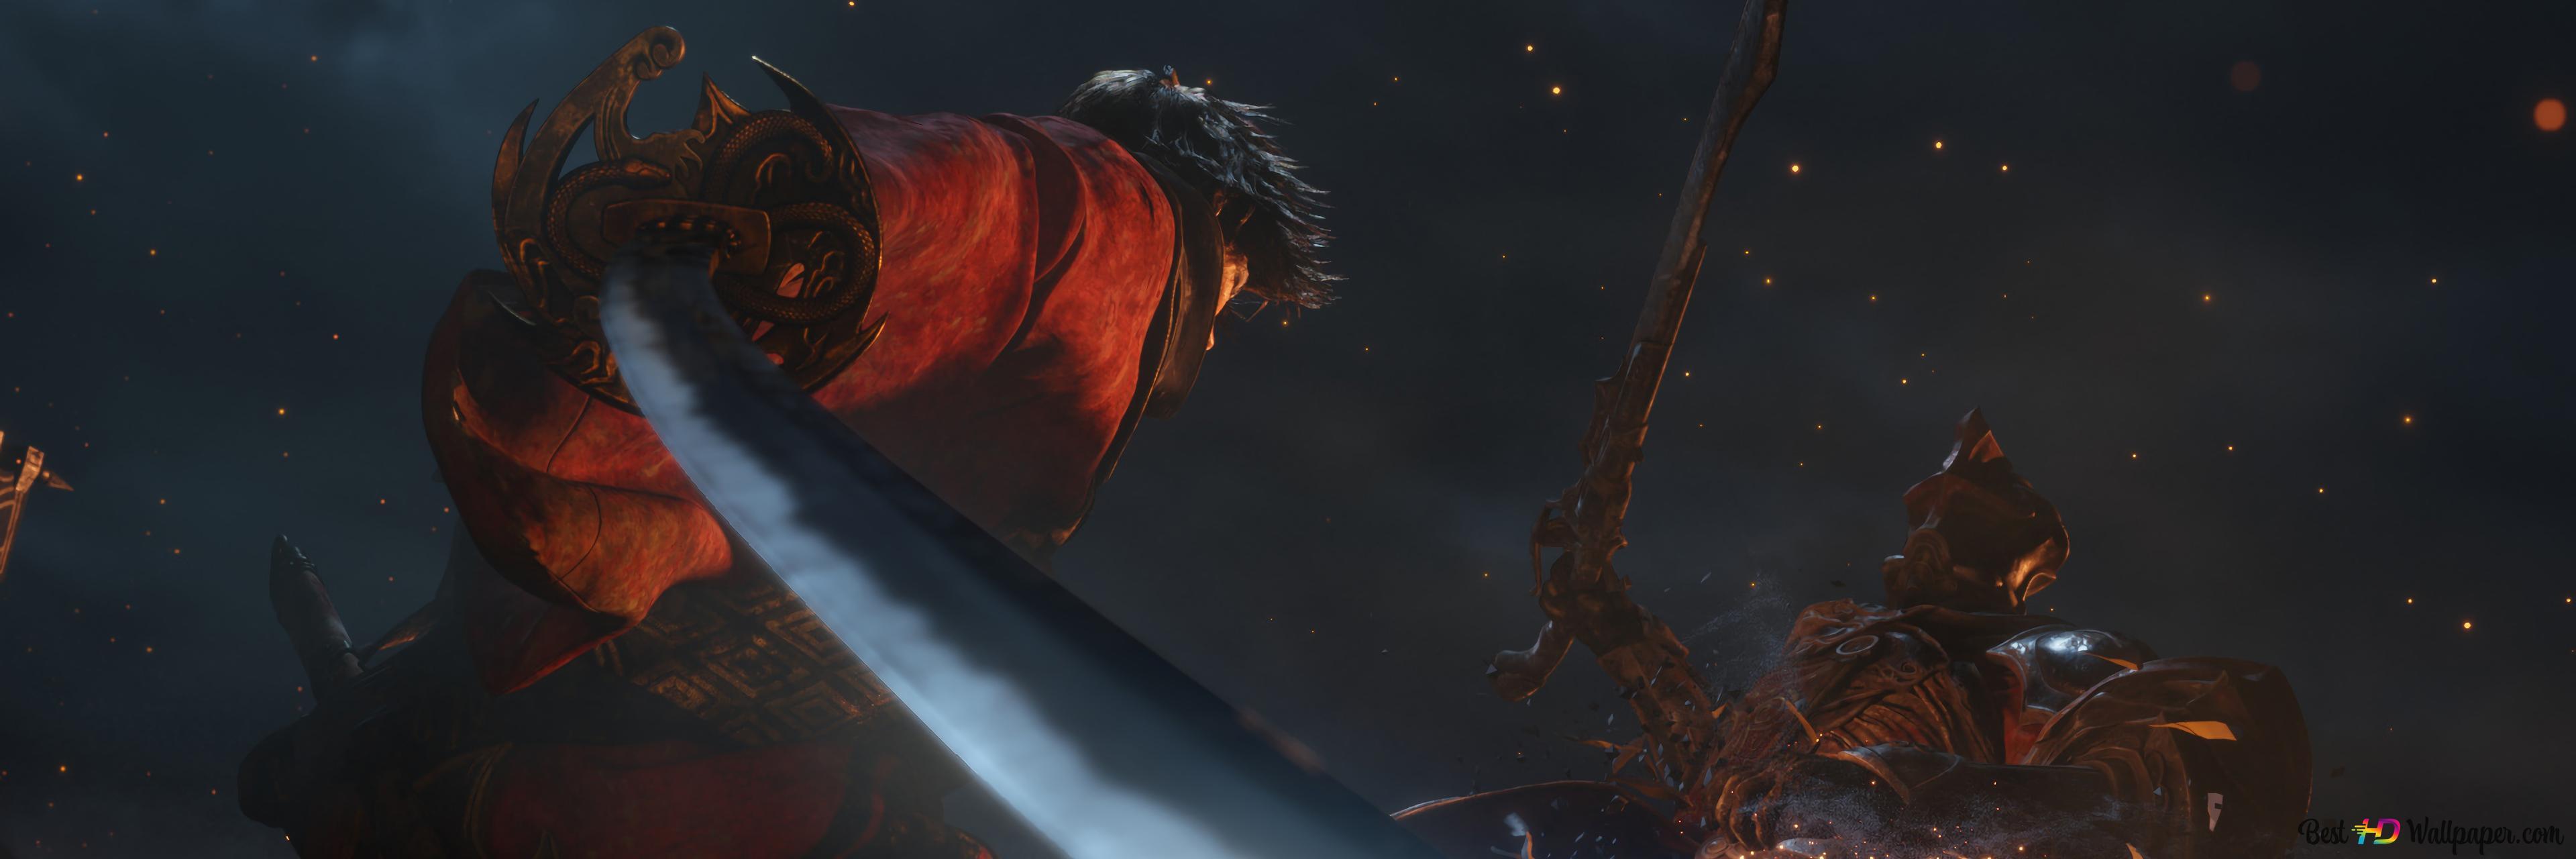 Final Fantasy Xiv Shadowbringers Square Enix Hd Wallpaper Download